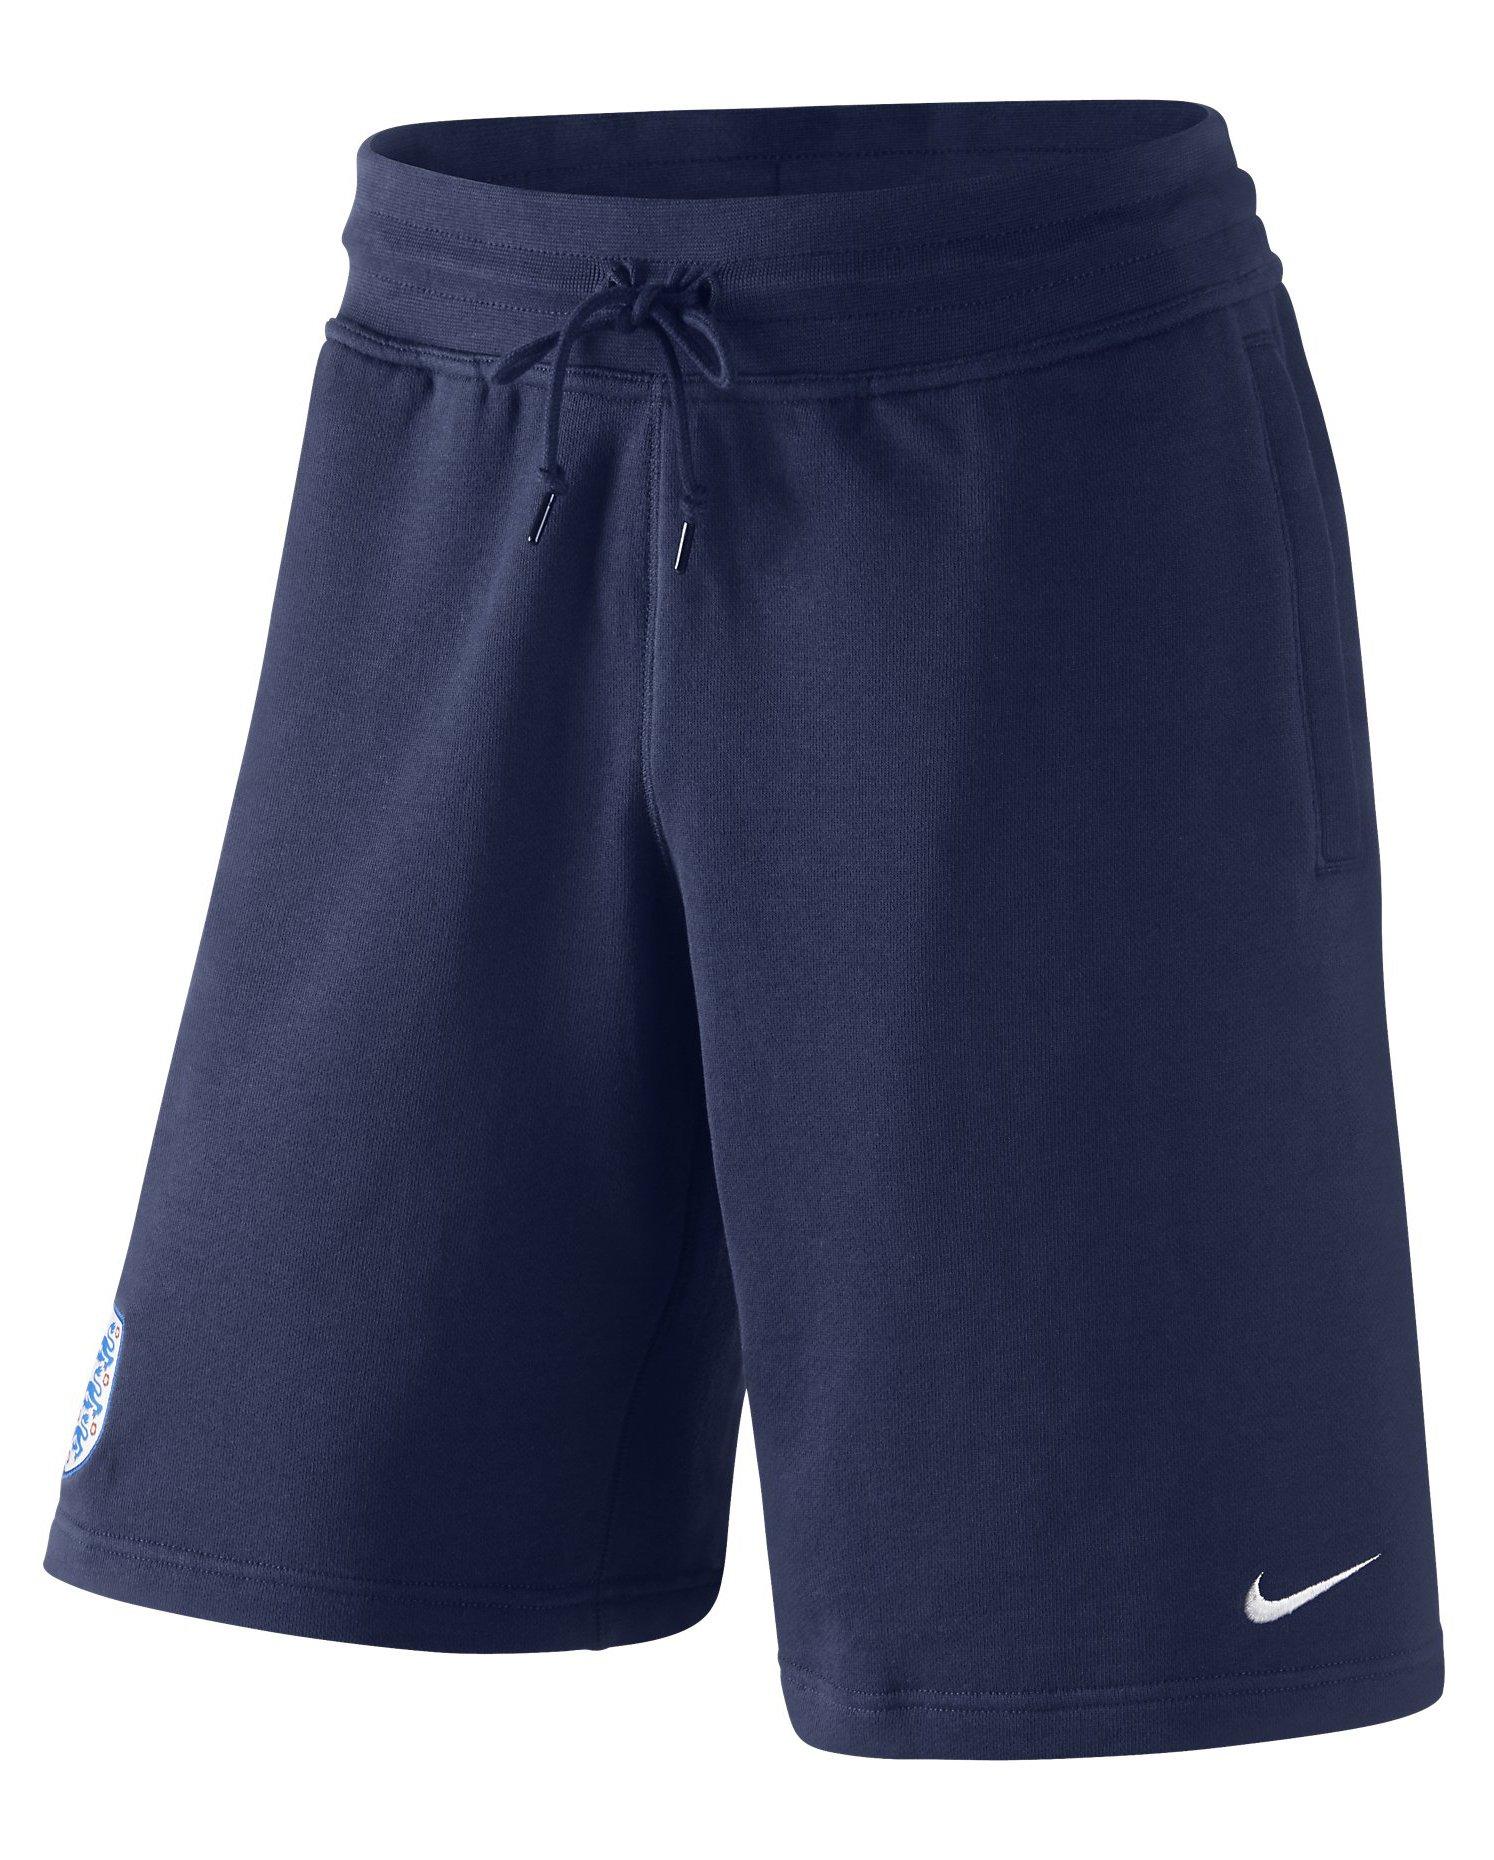 Šortky Nike ENT AUTH AW77 ALUMNI SHORT